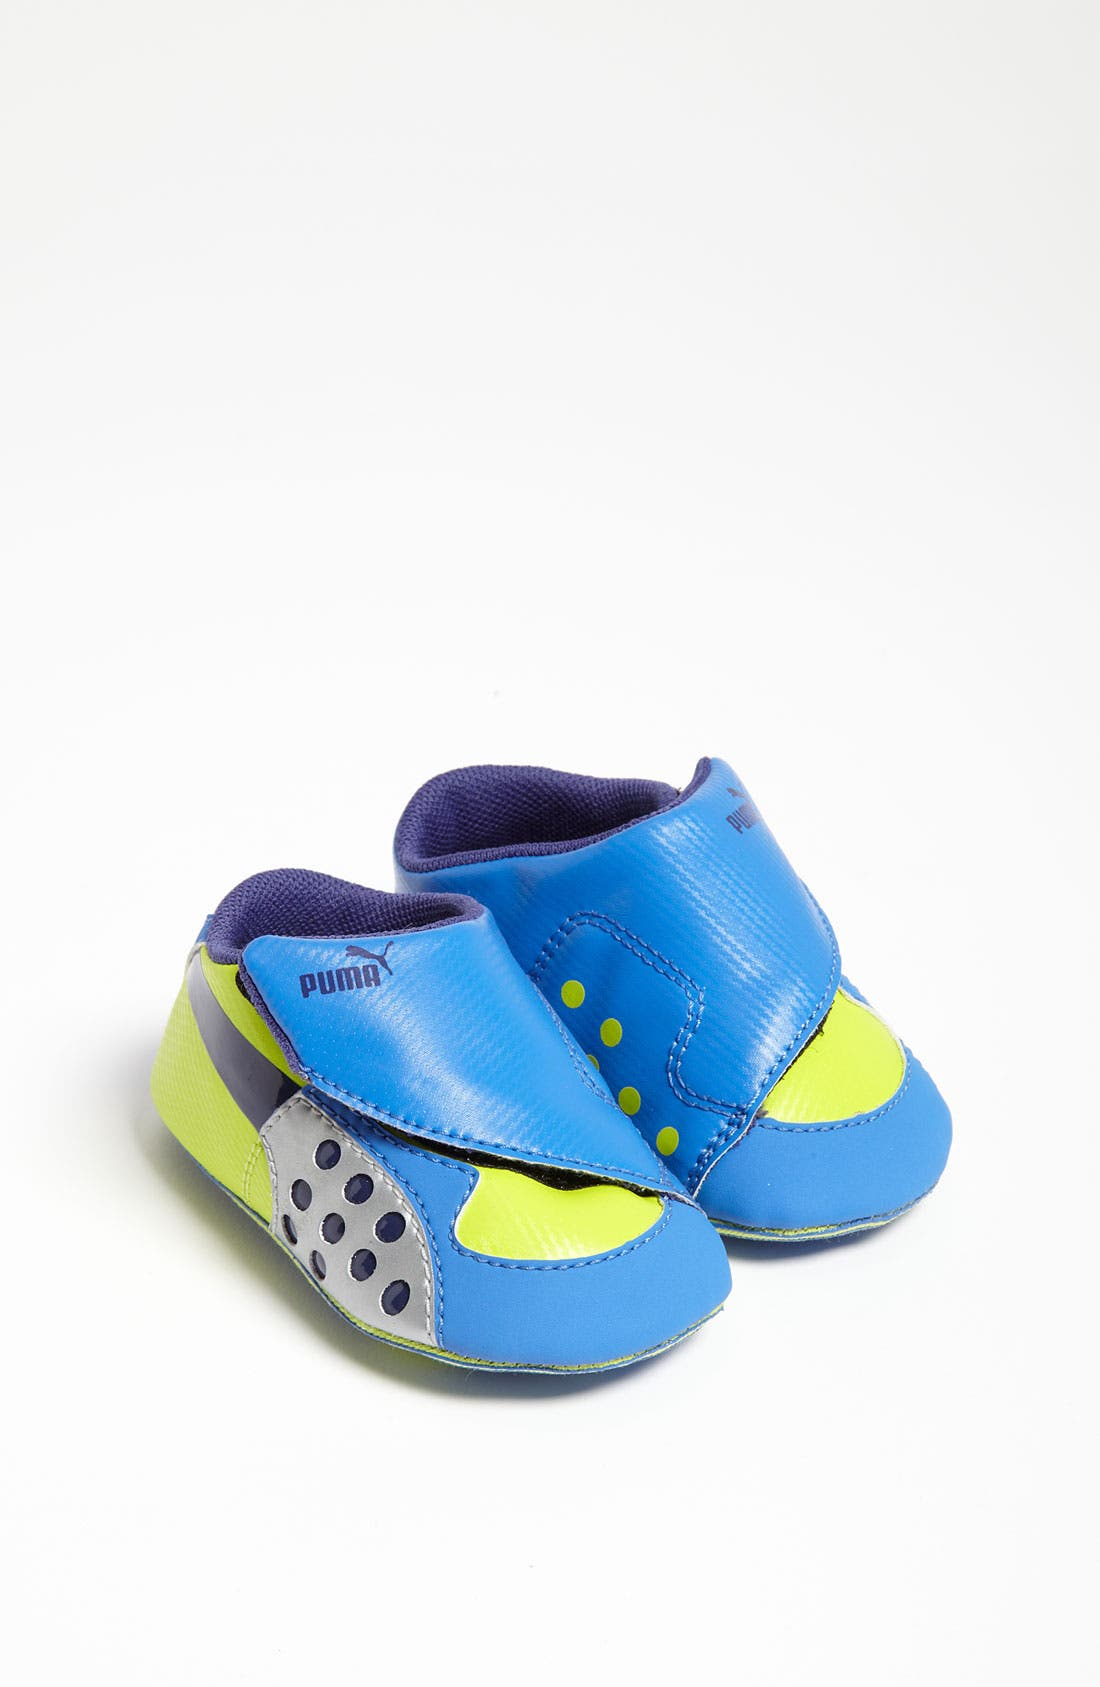 Main Image - PUMA 'Faas 300 Lil' Wrap' Crib Sneaker (Baby)